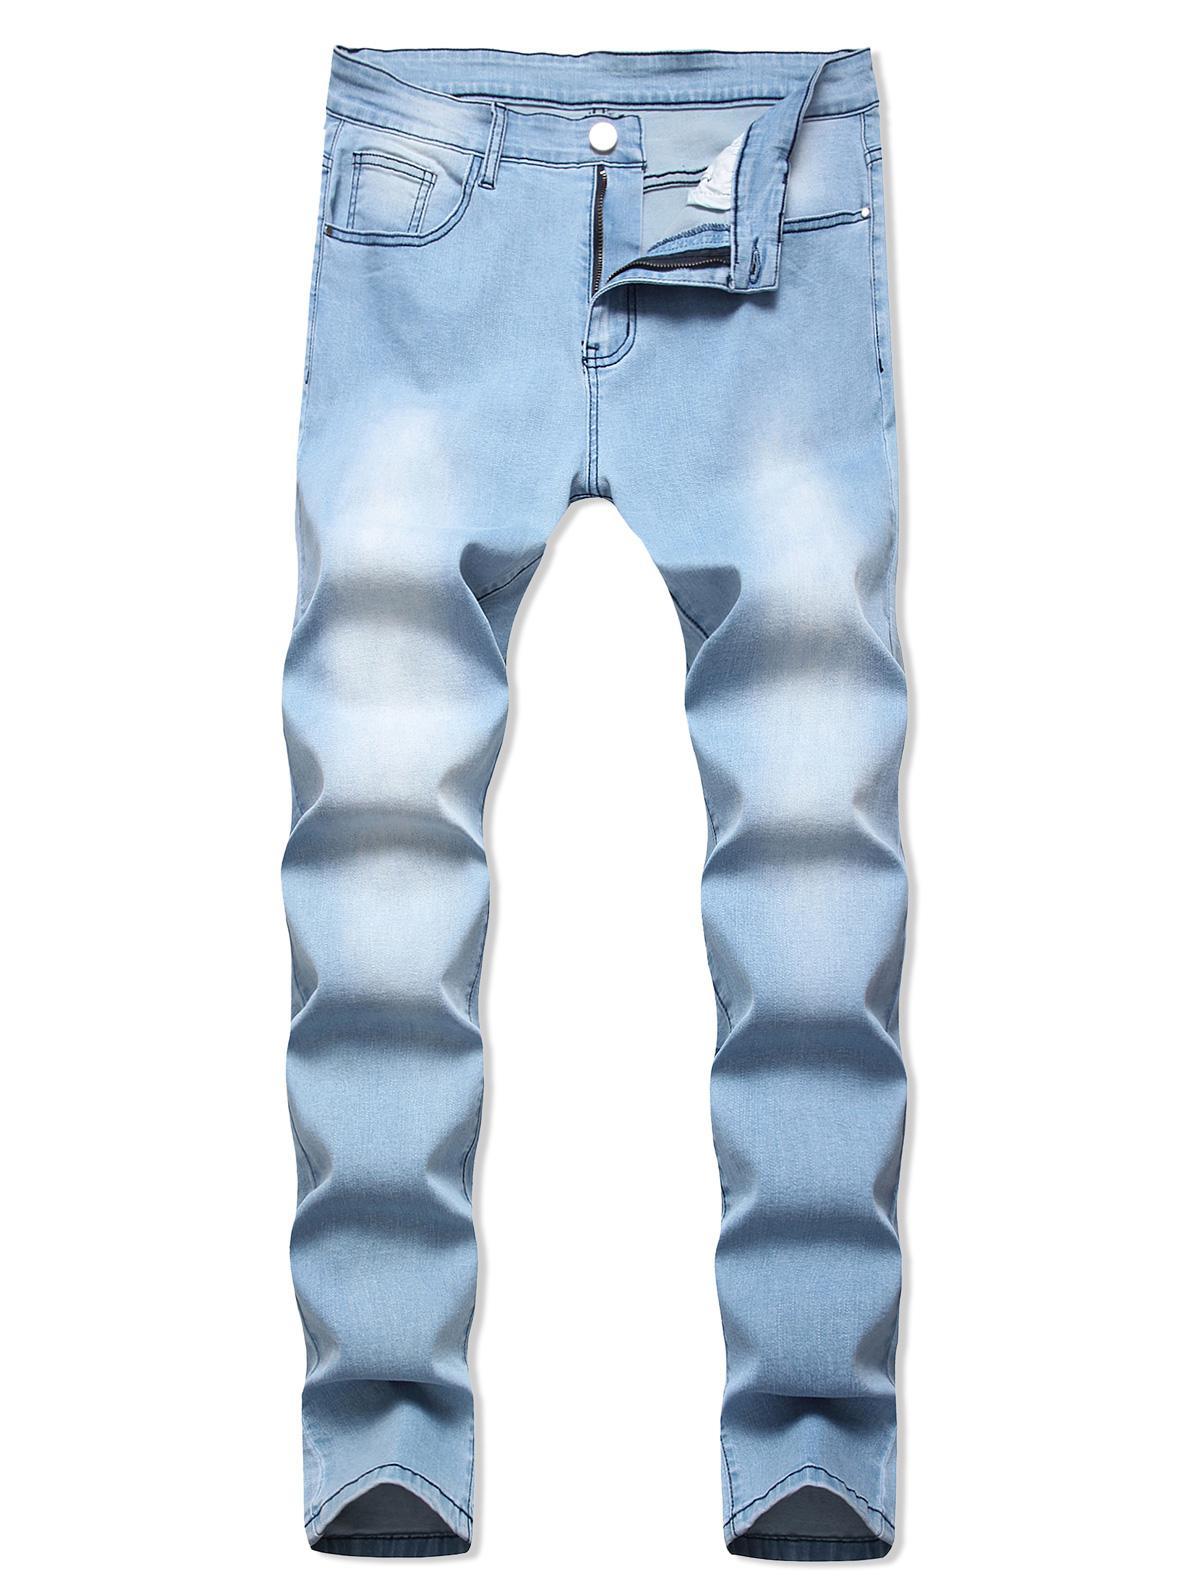 Light Wash Zipper Fly Casual Jeans фото